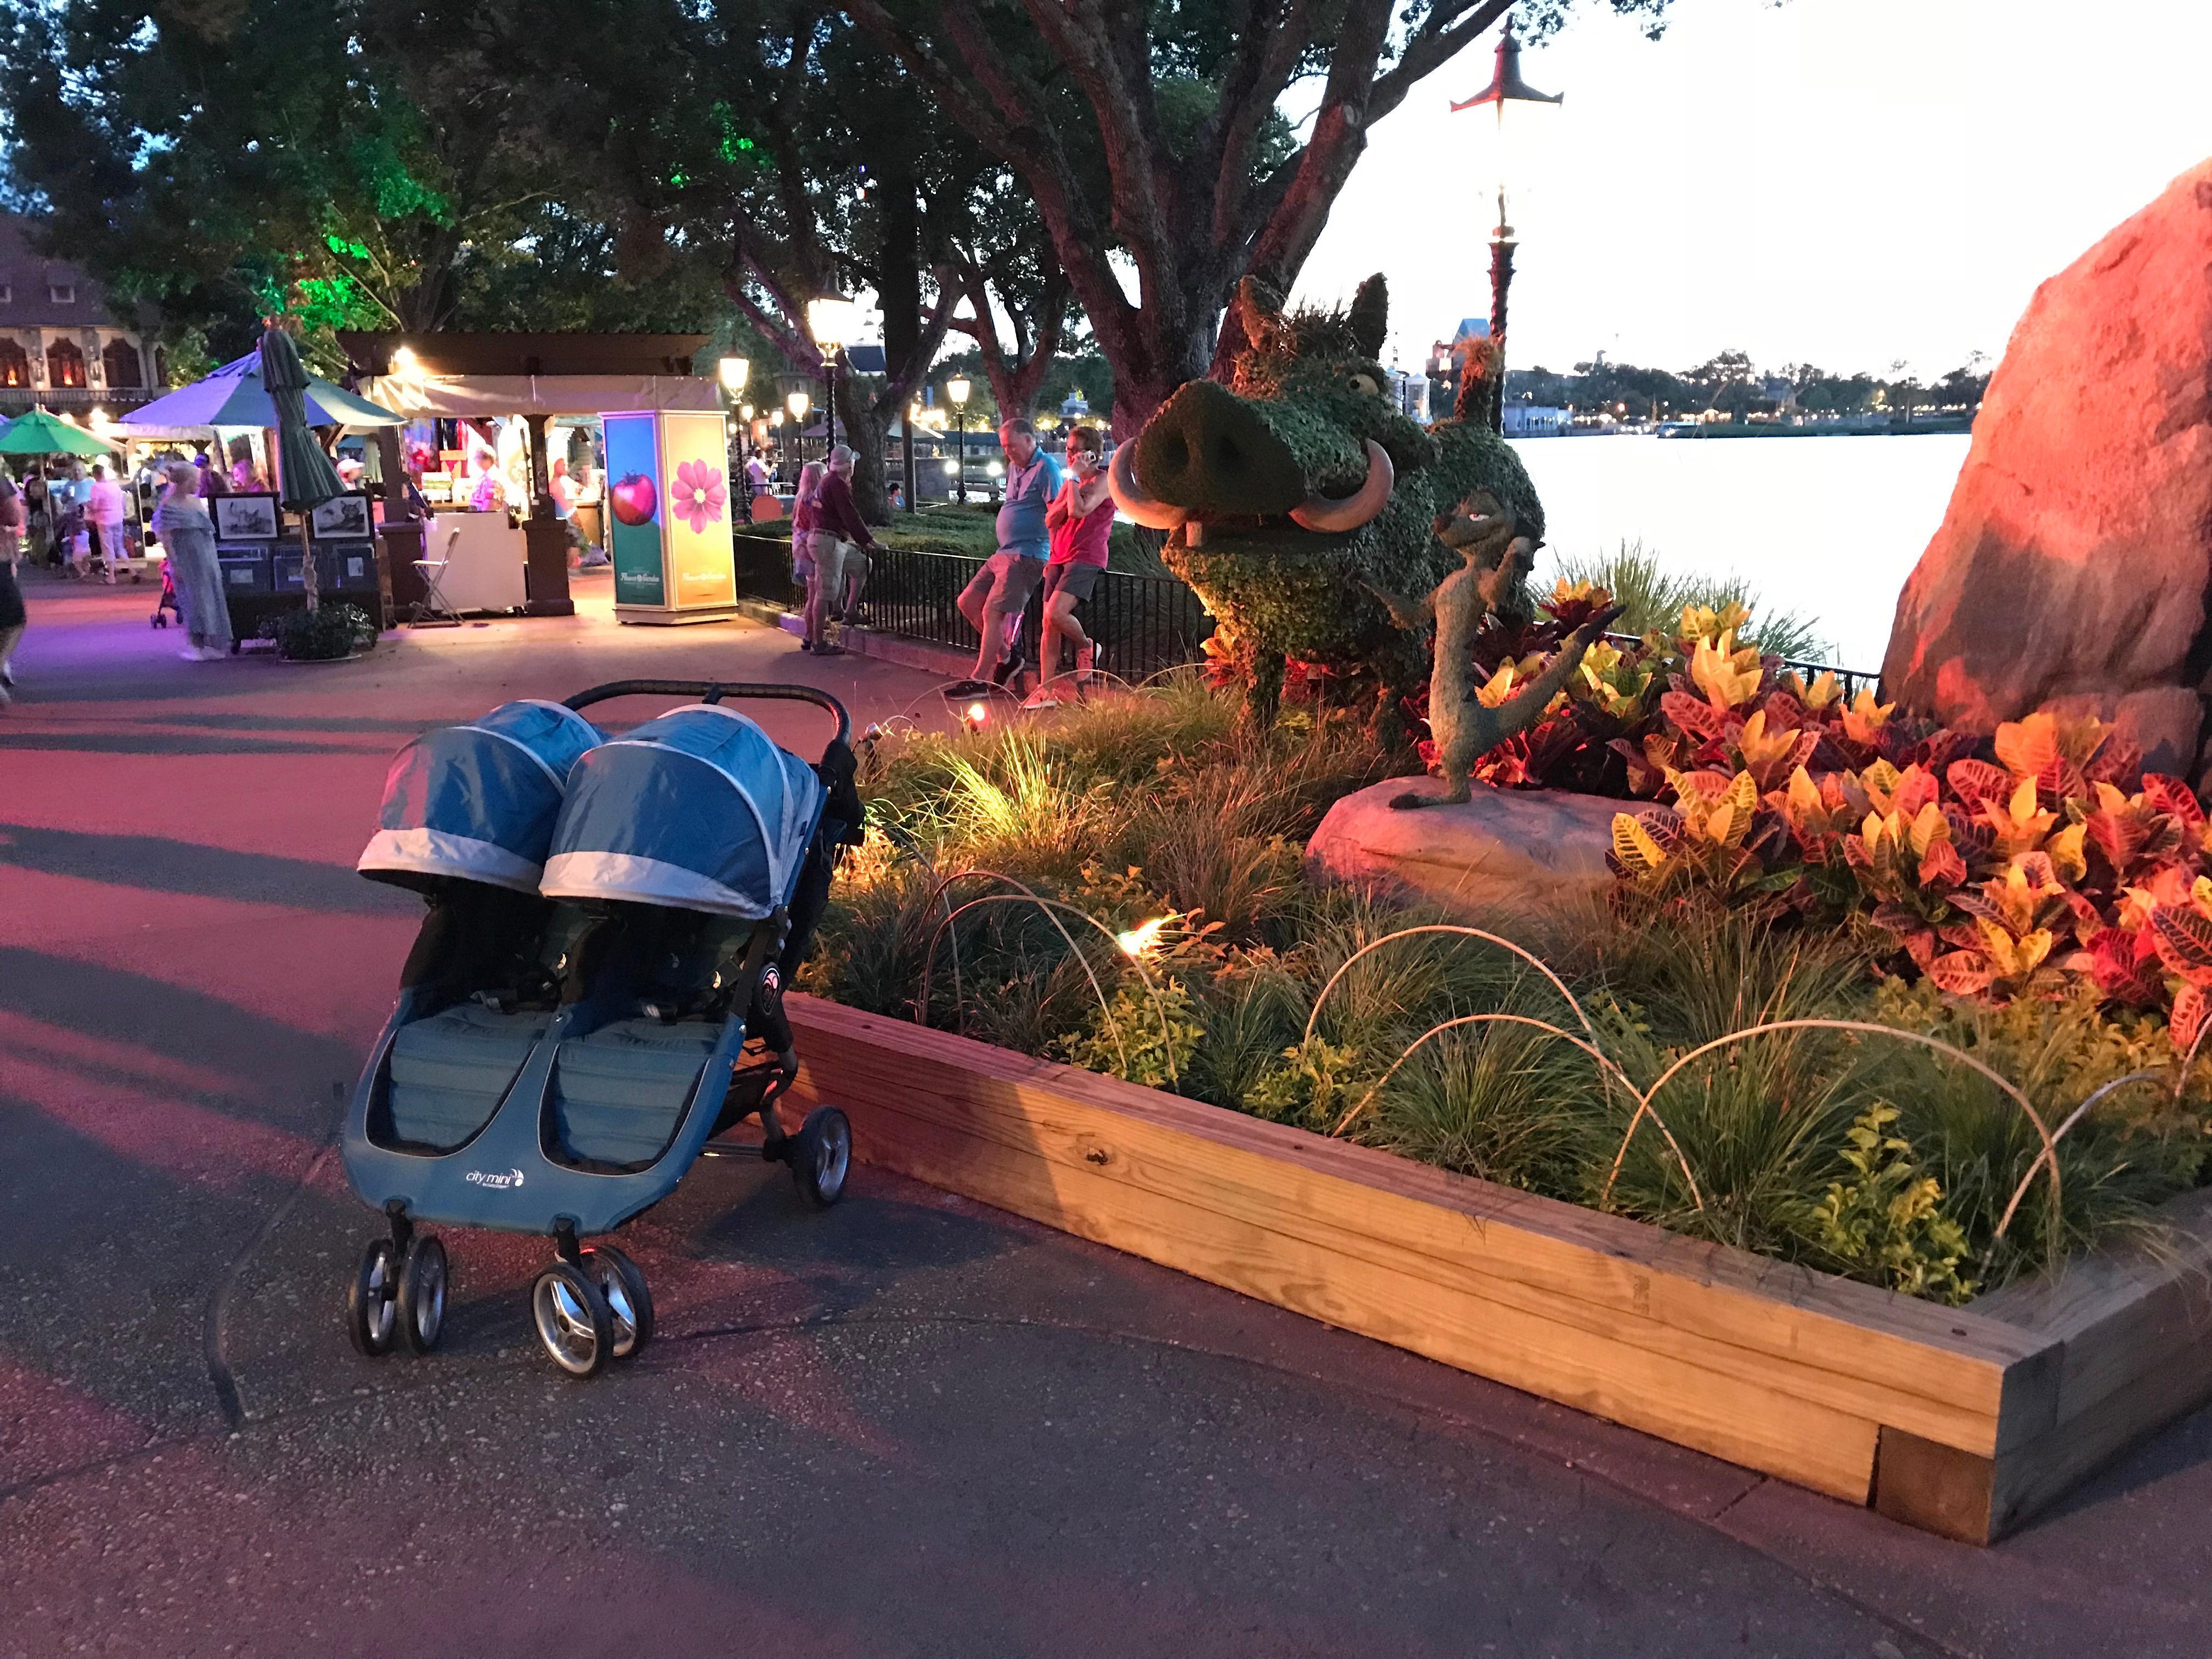 Stroller Rentals Disney image 40